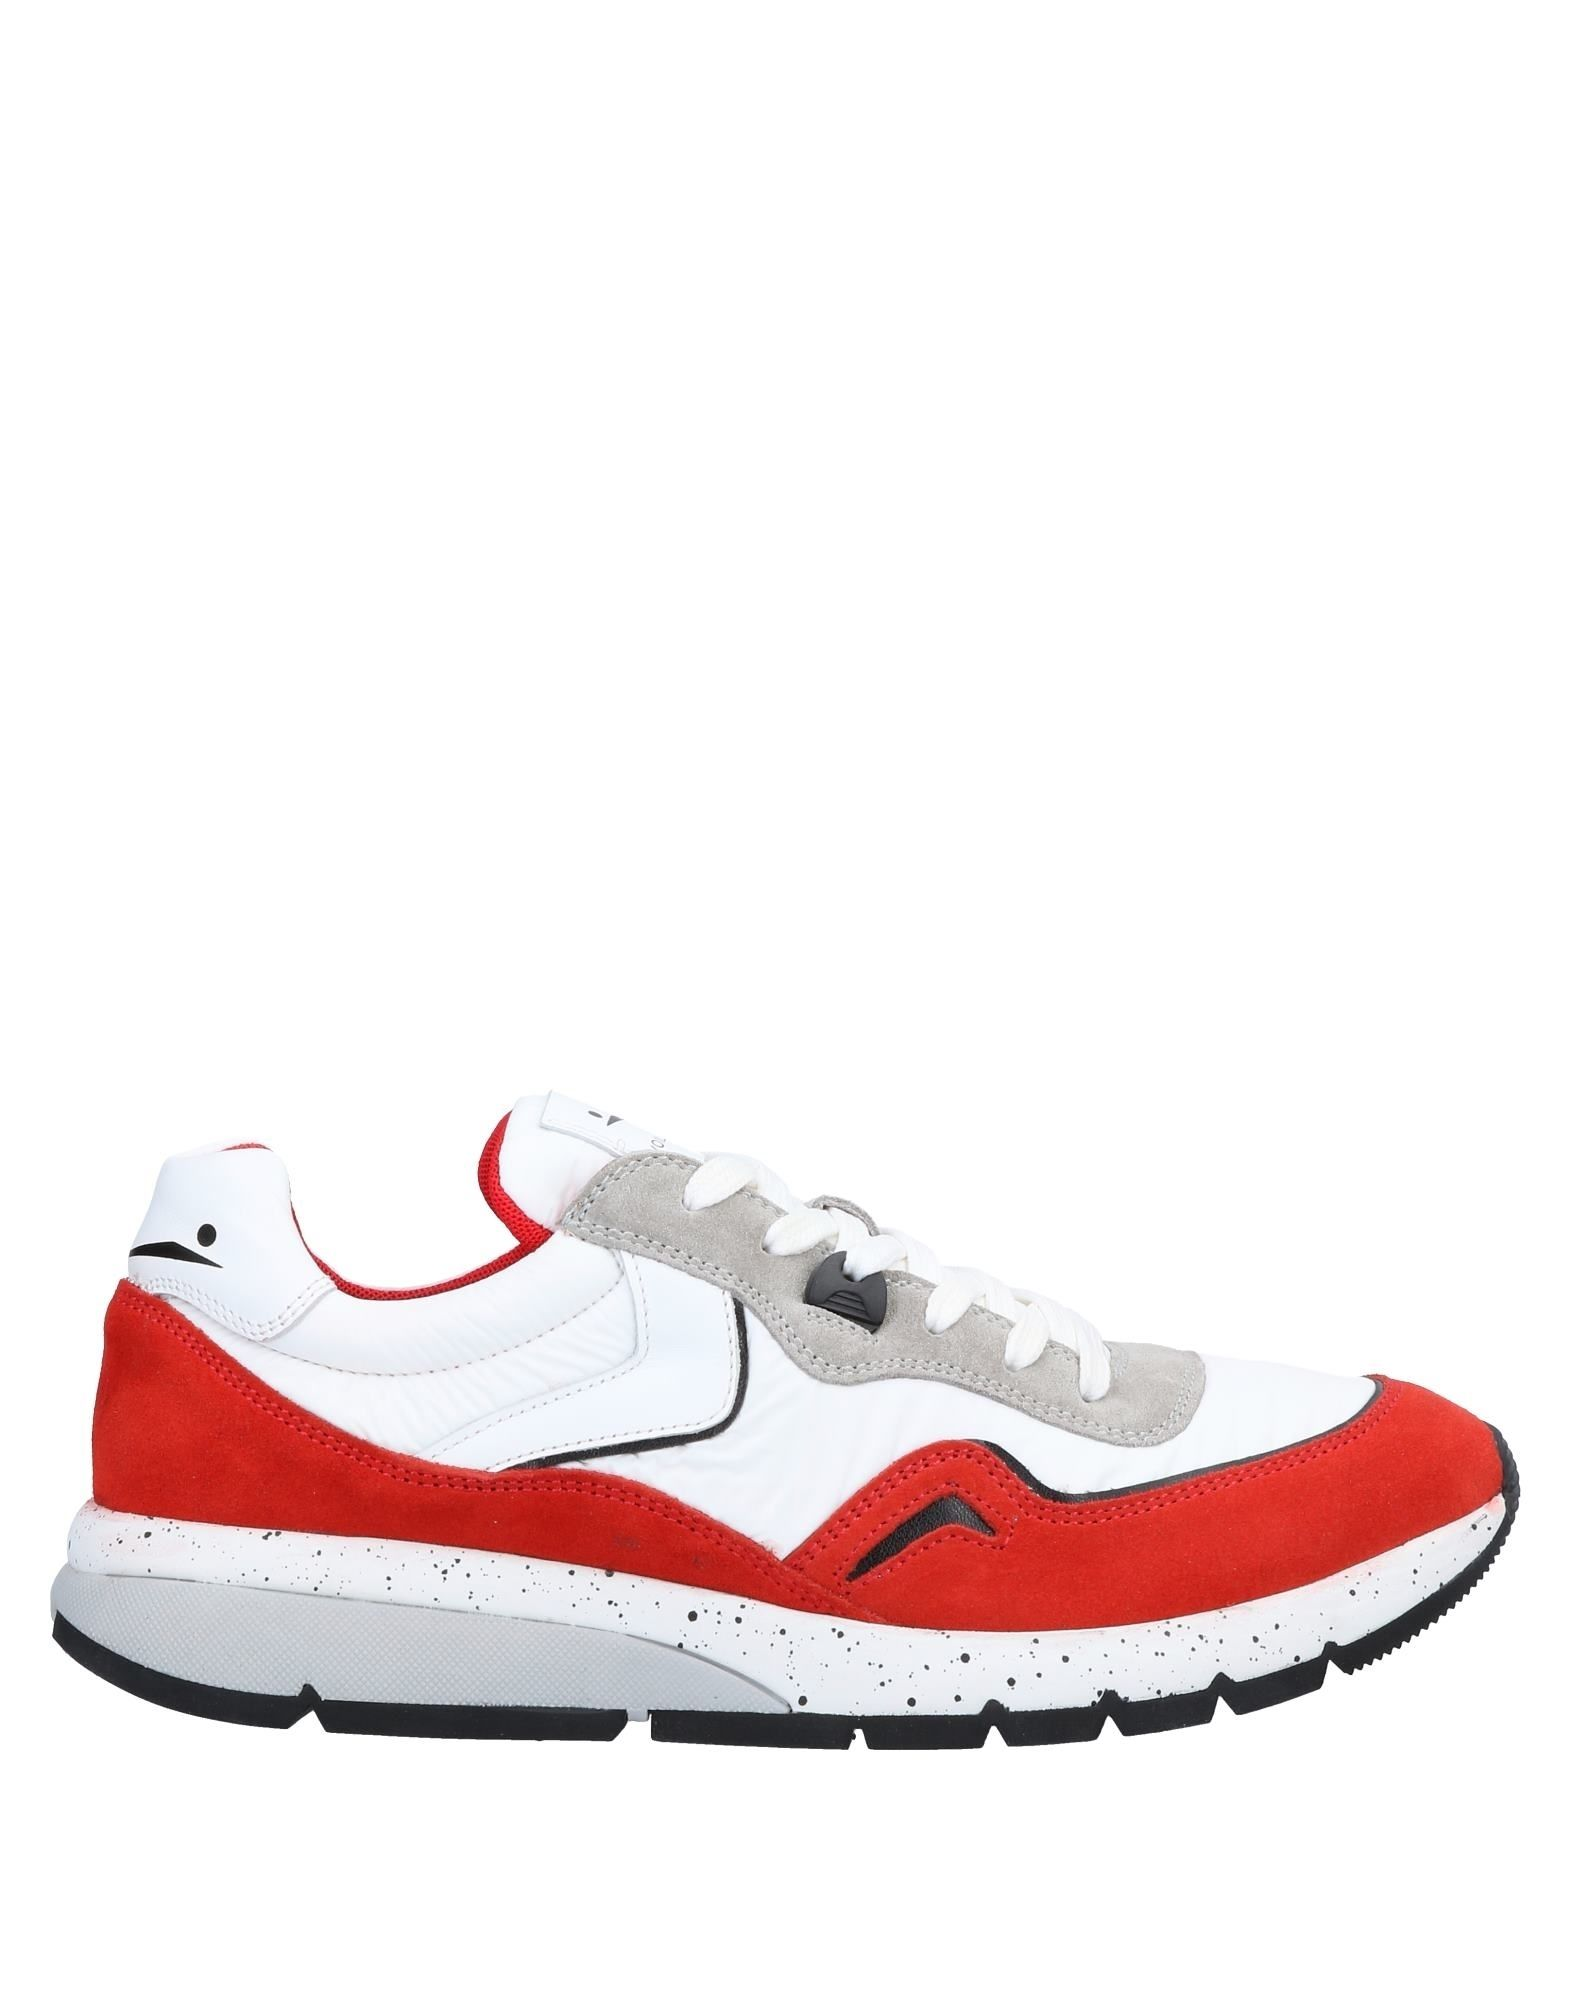 Zapatillas Voile Blanche Hombre Blanche - Zapatillas Voile Blanche Hombre  Rojo b2a25a